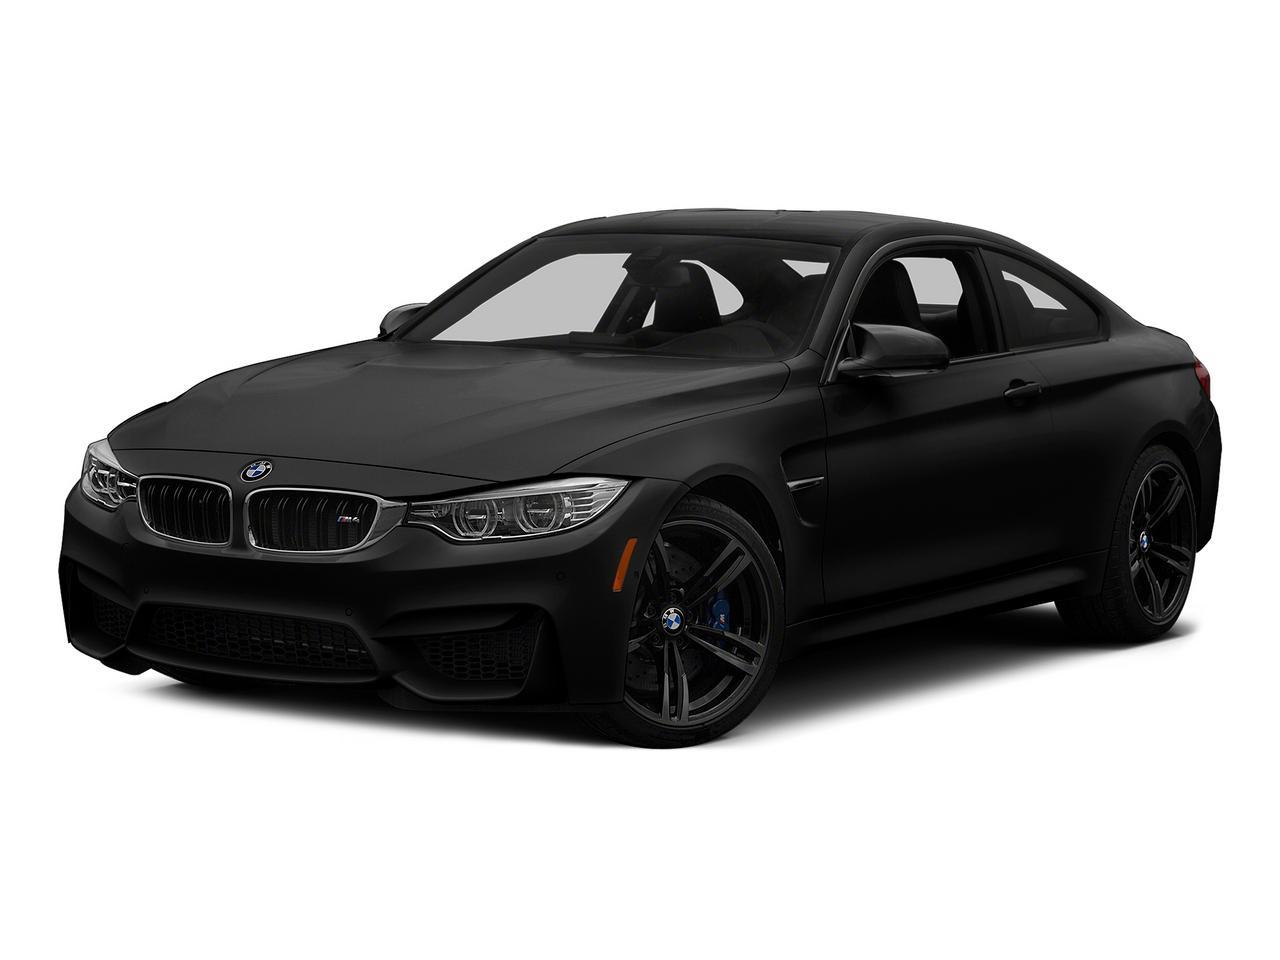 2015 BMW M4 Vehicle Photo in North Charleston, SC 29406